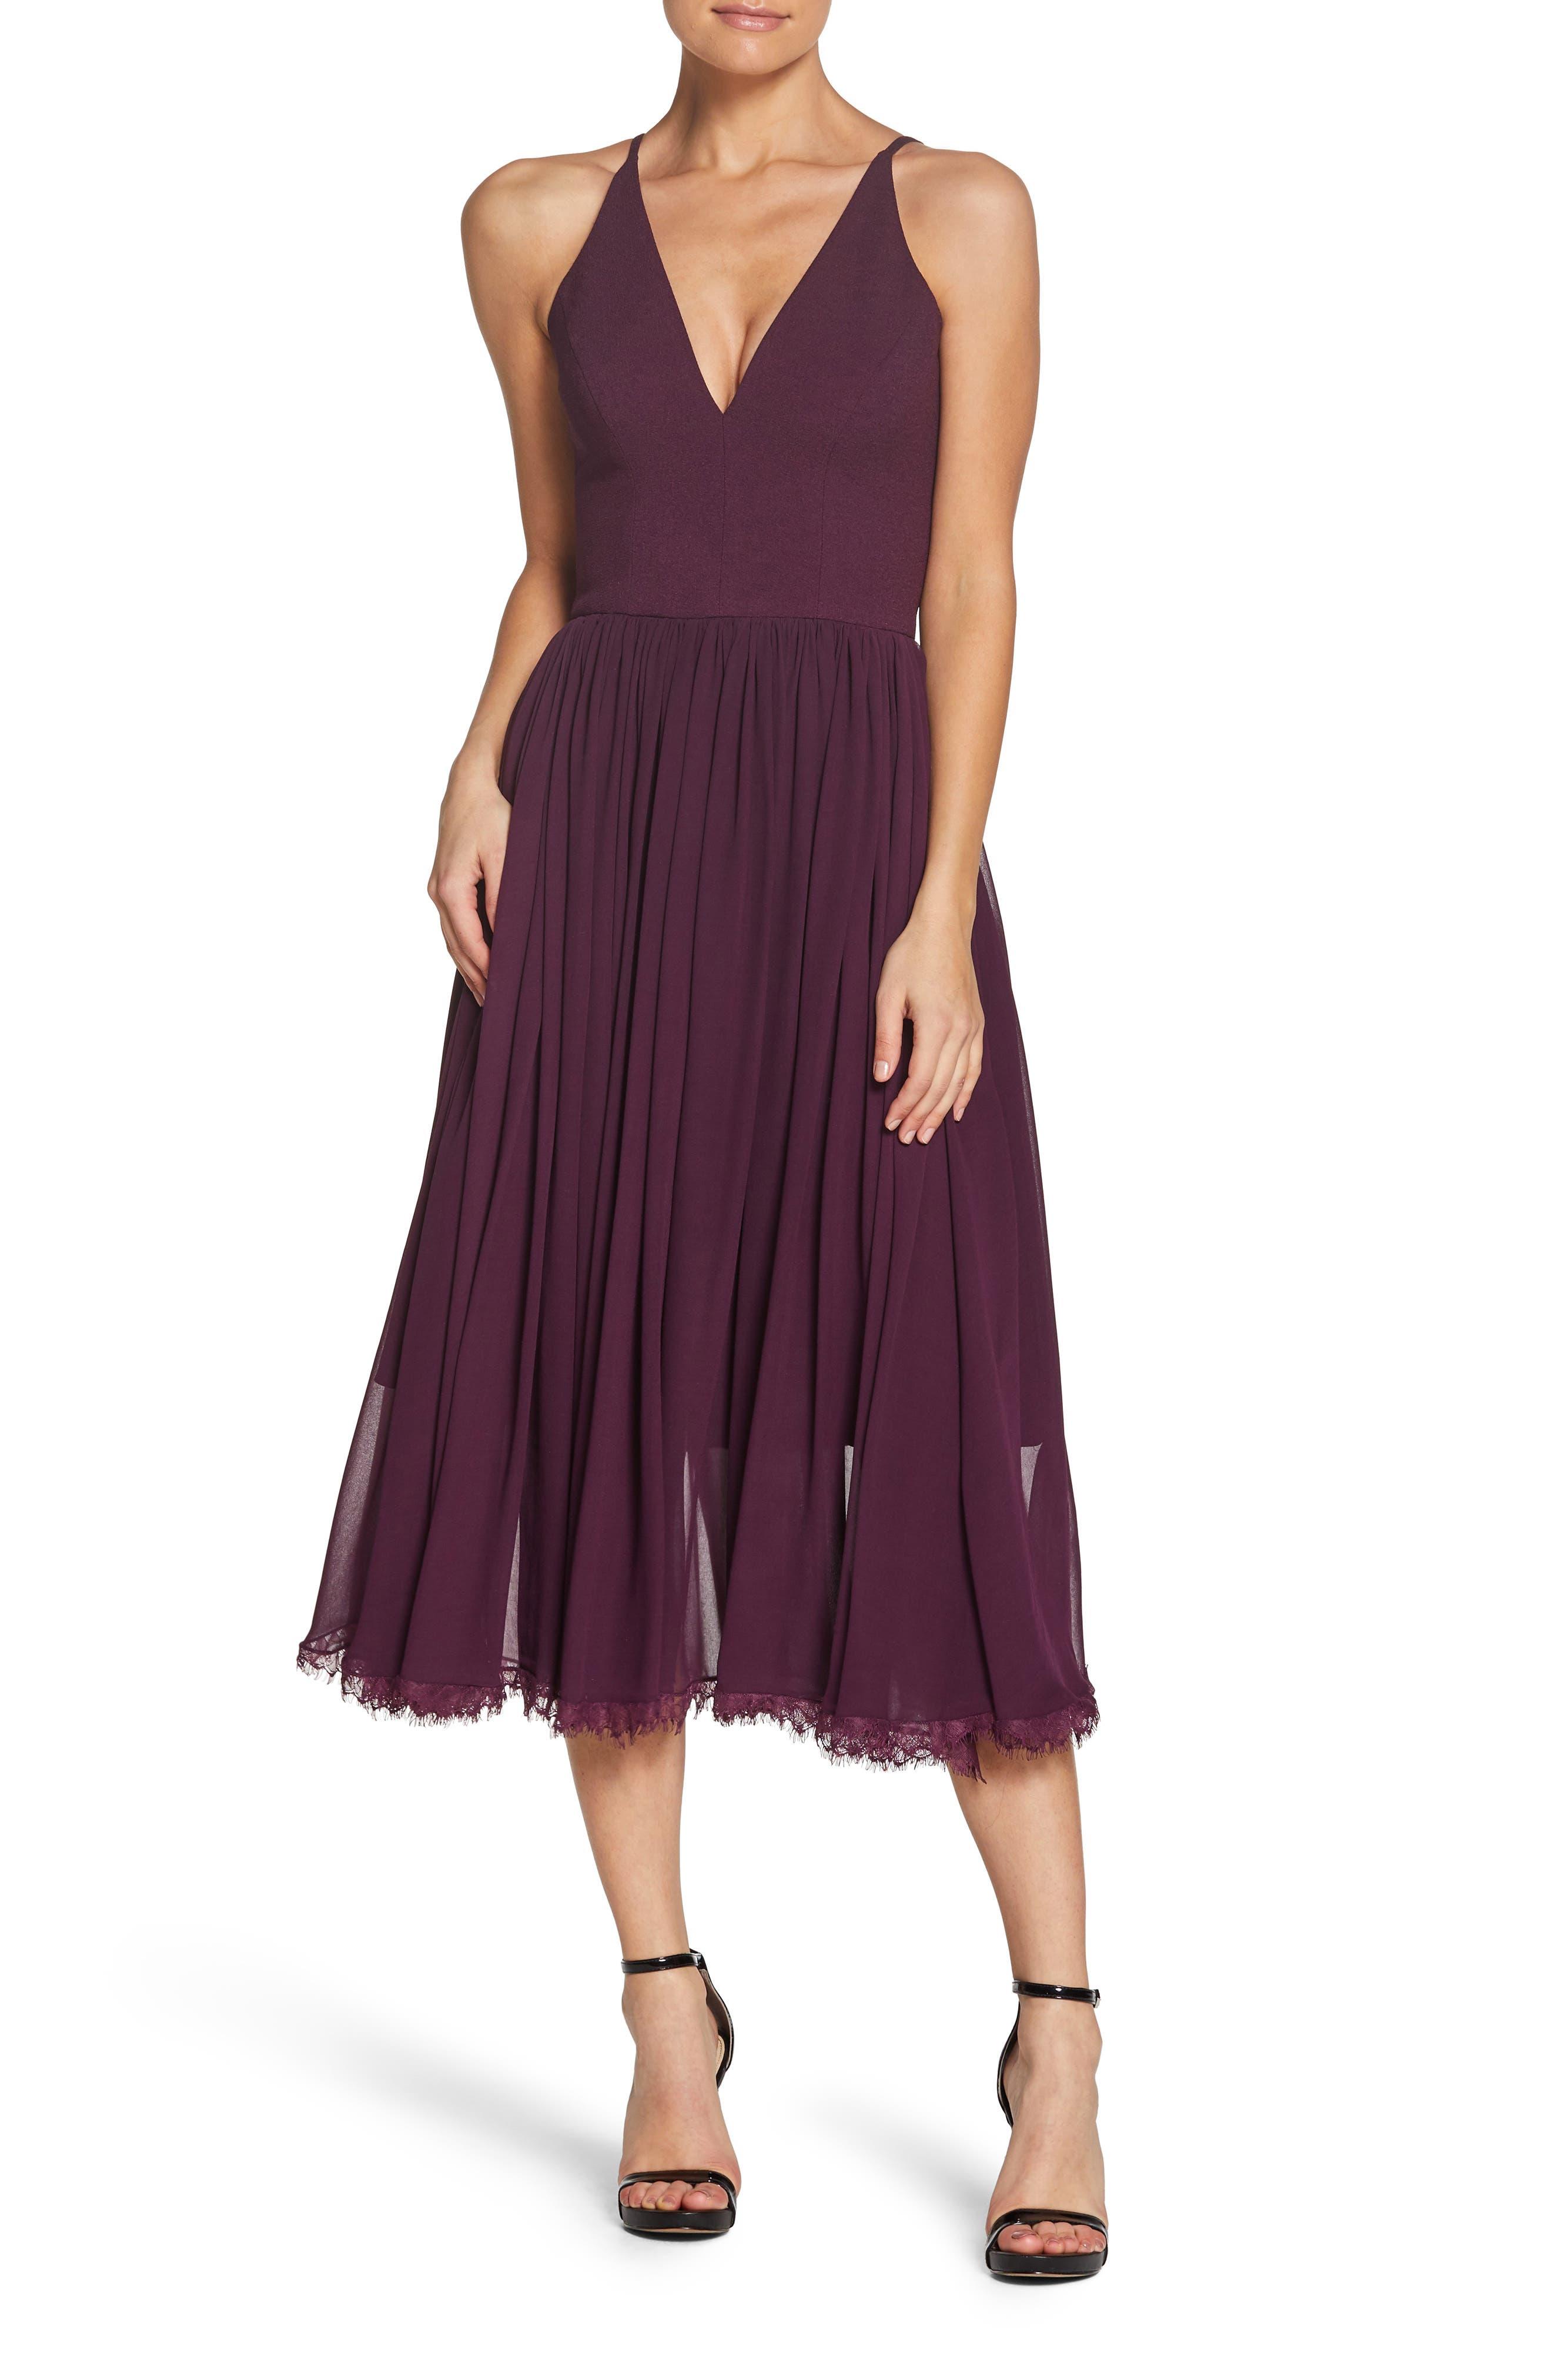 Alicia Mixed Media Midi Dress,                             Main thumbnail 1, color,                             PLUM